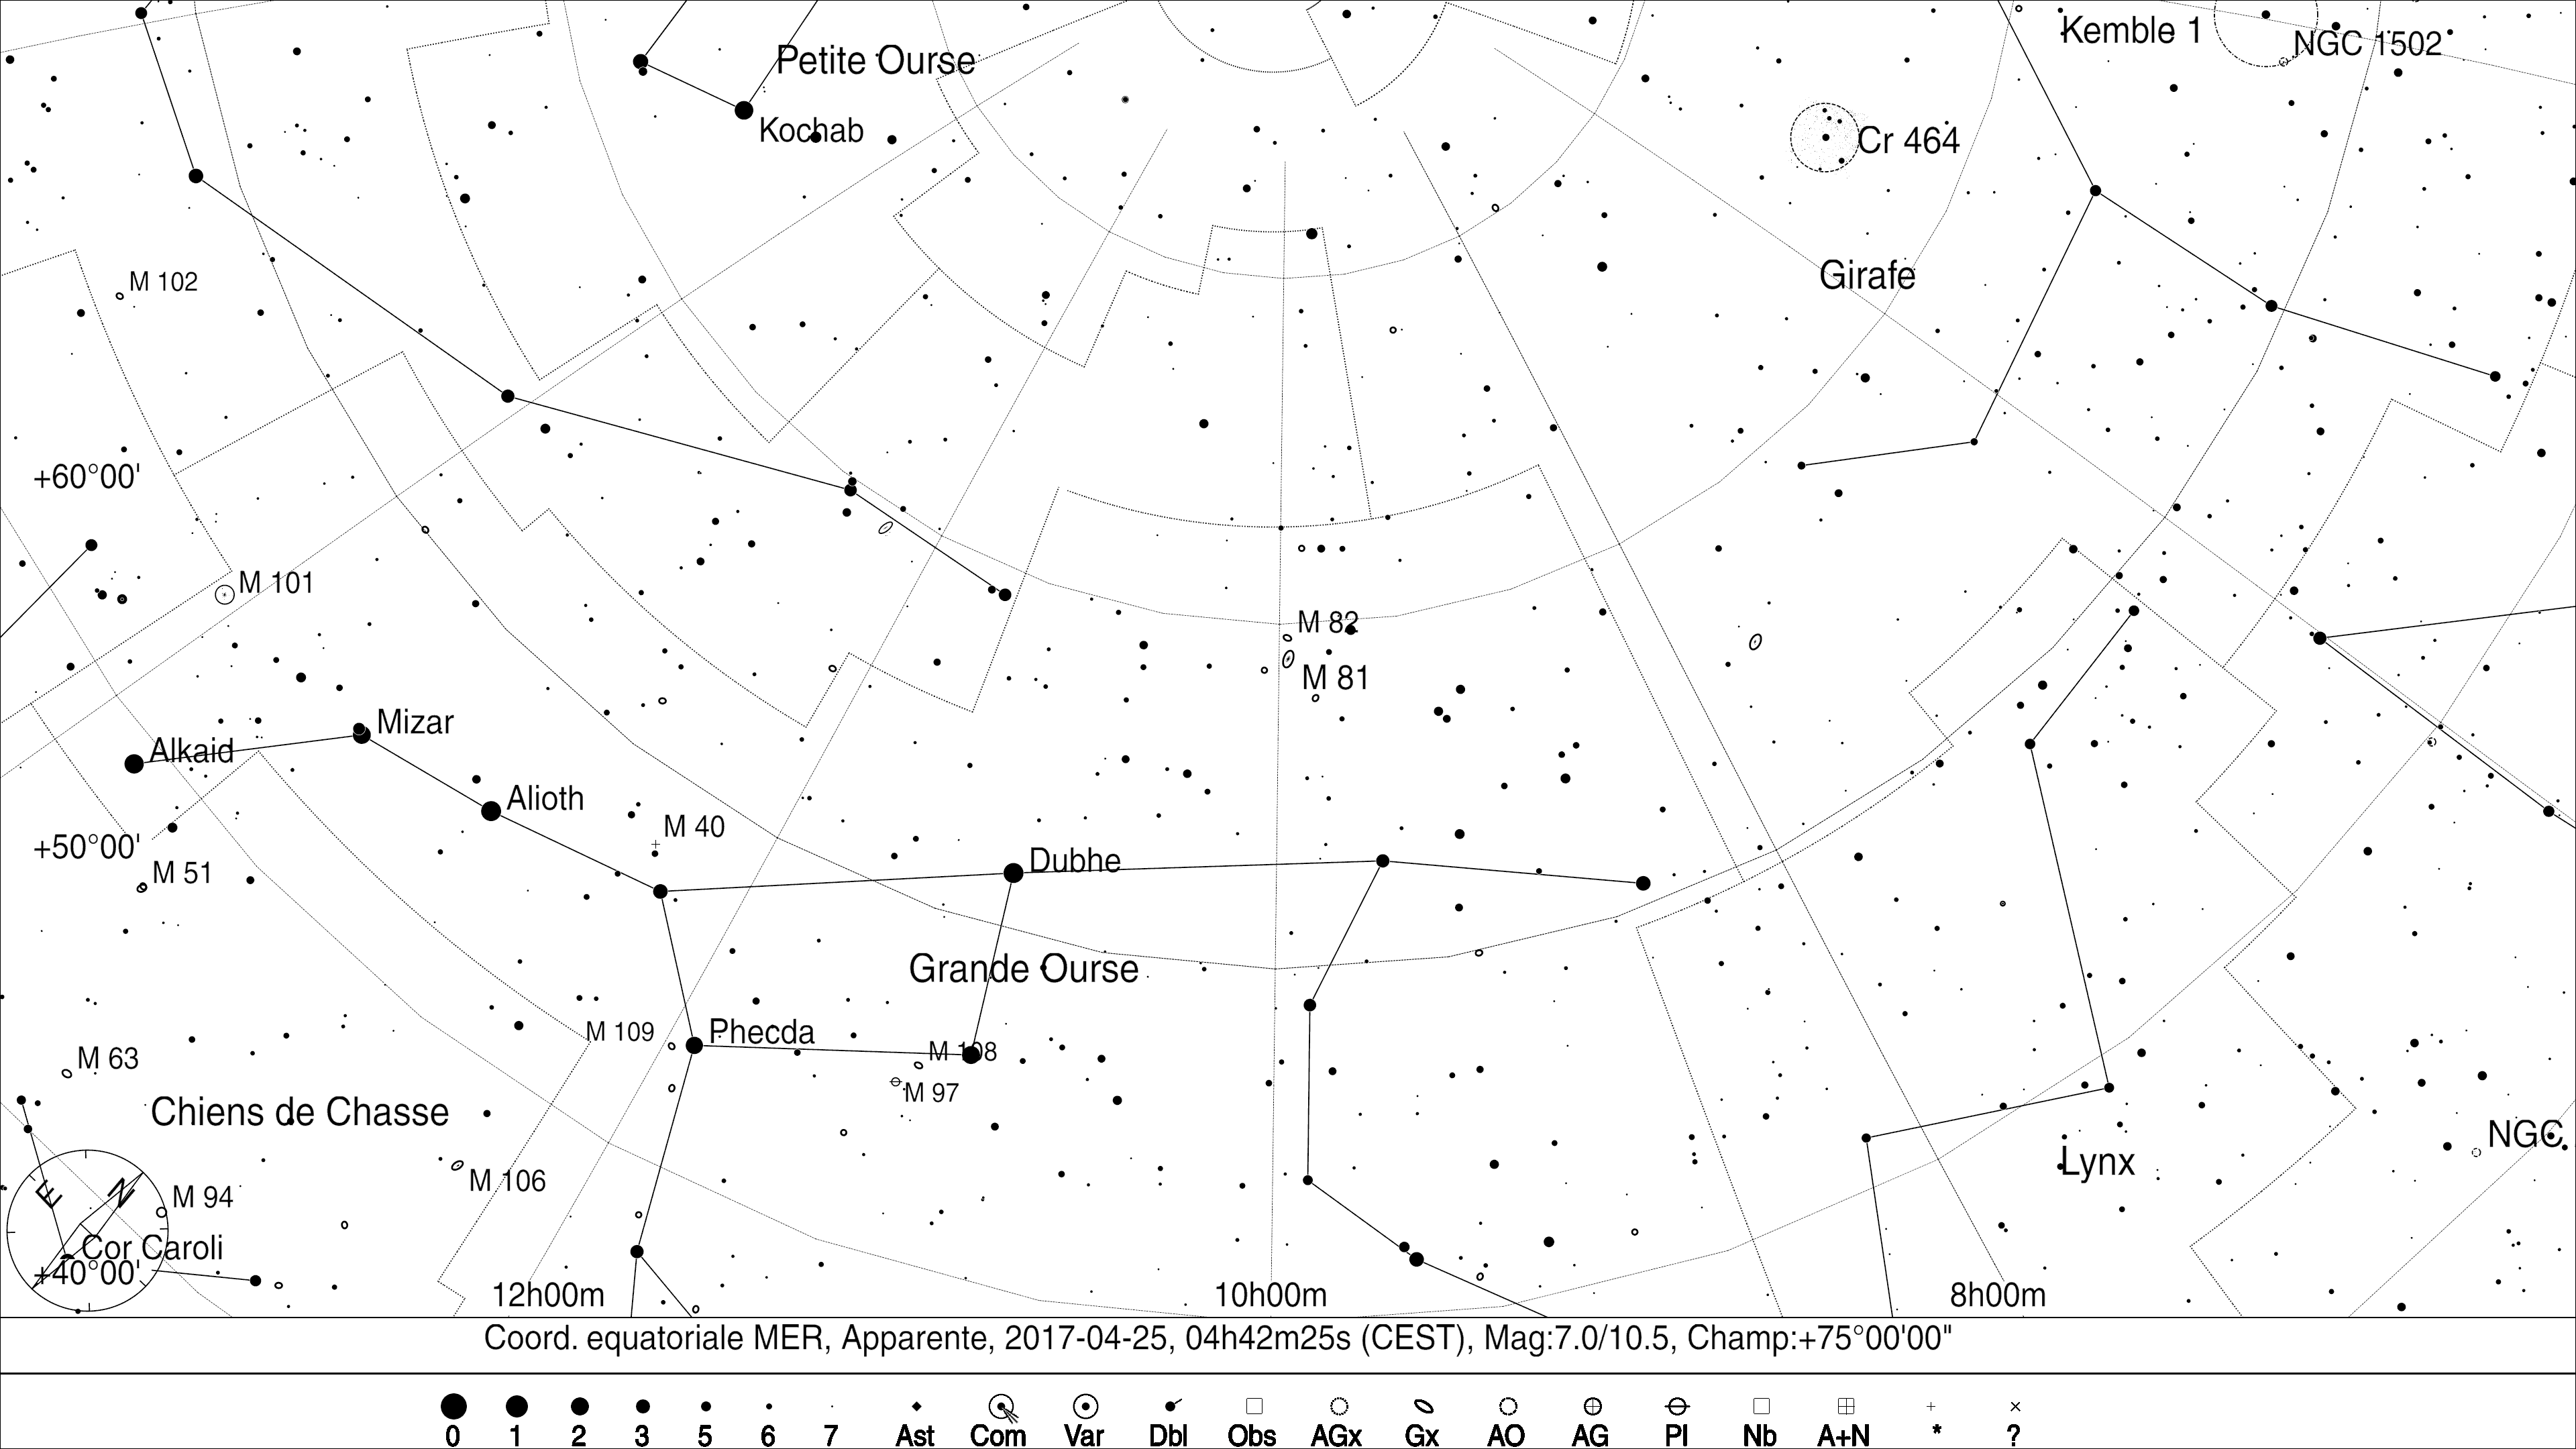 M81_75